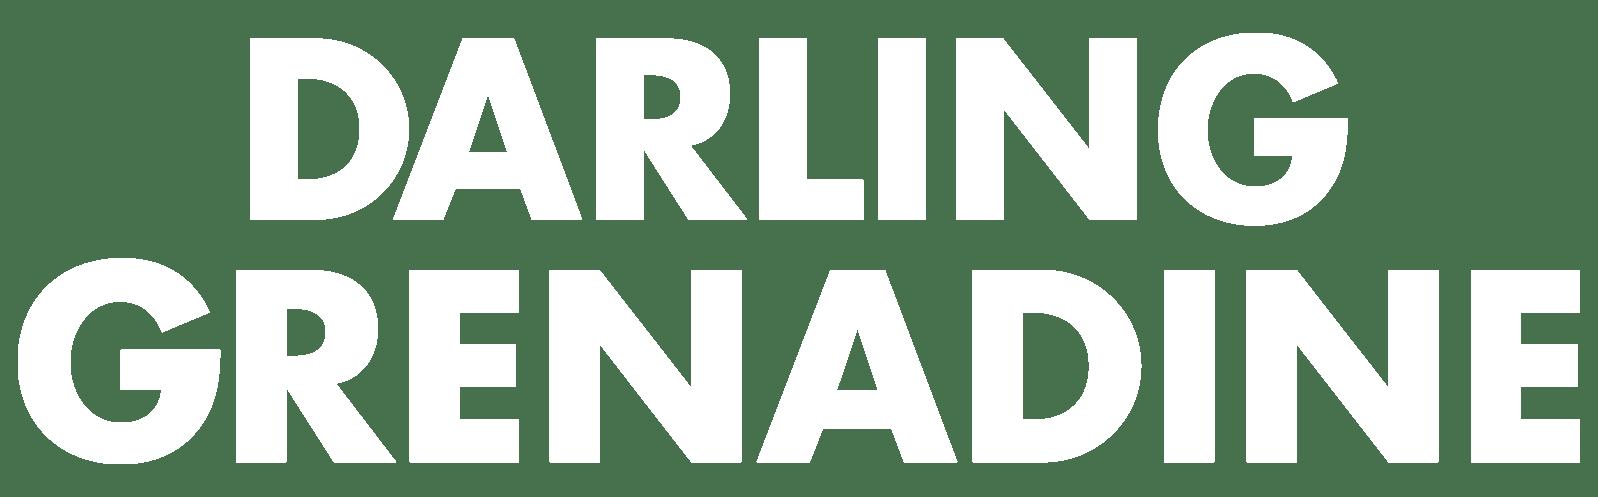 Artwork for Darling Grenadine